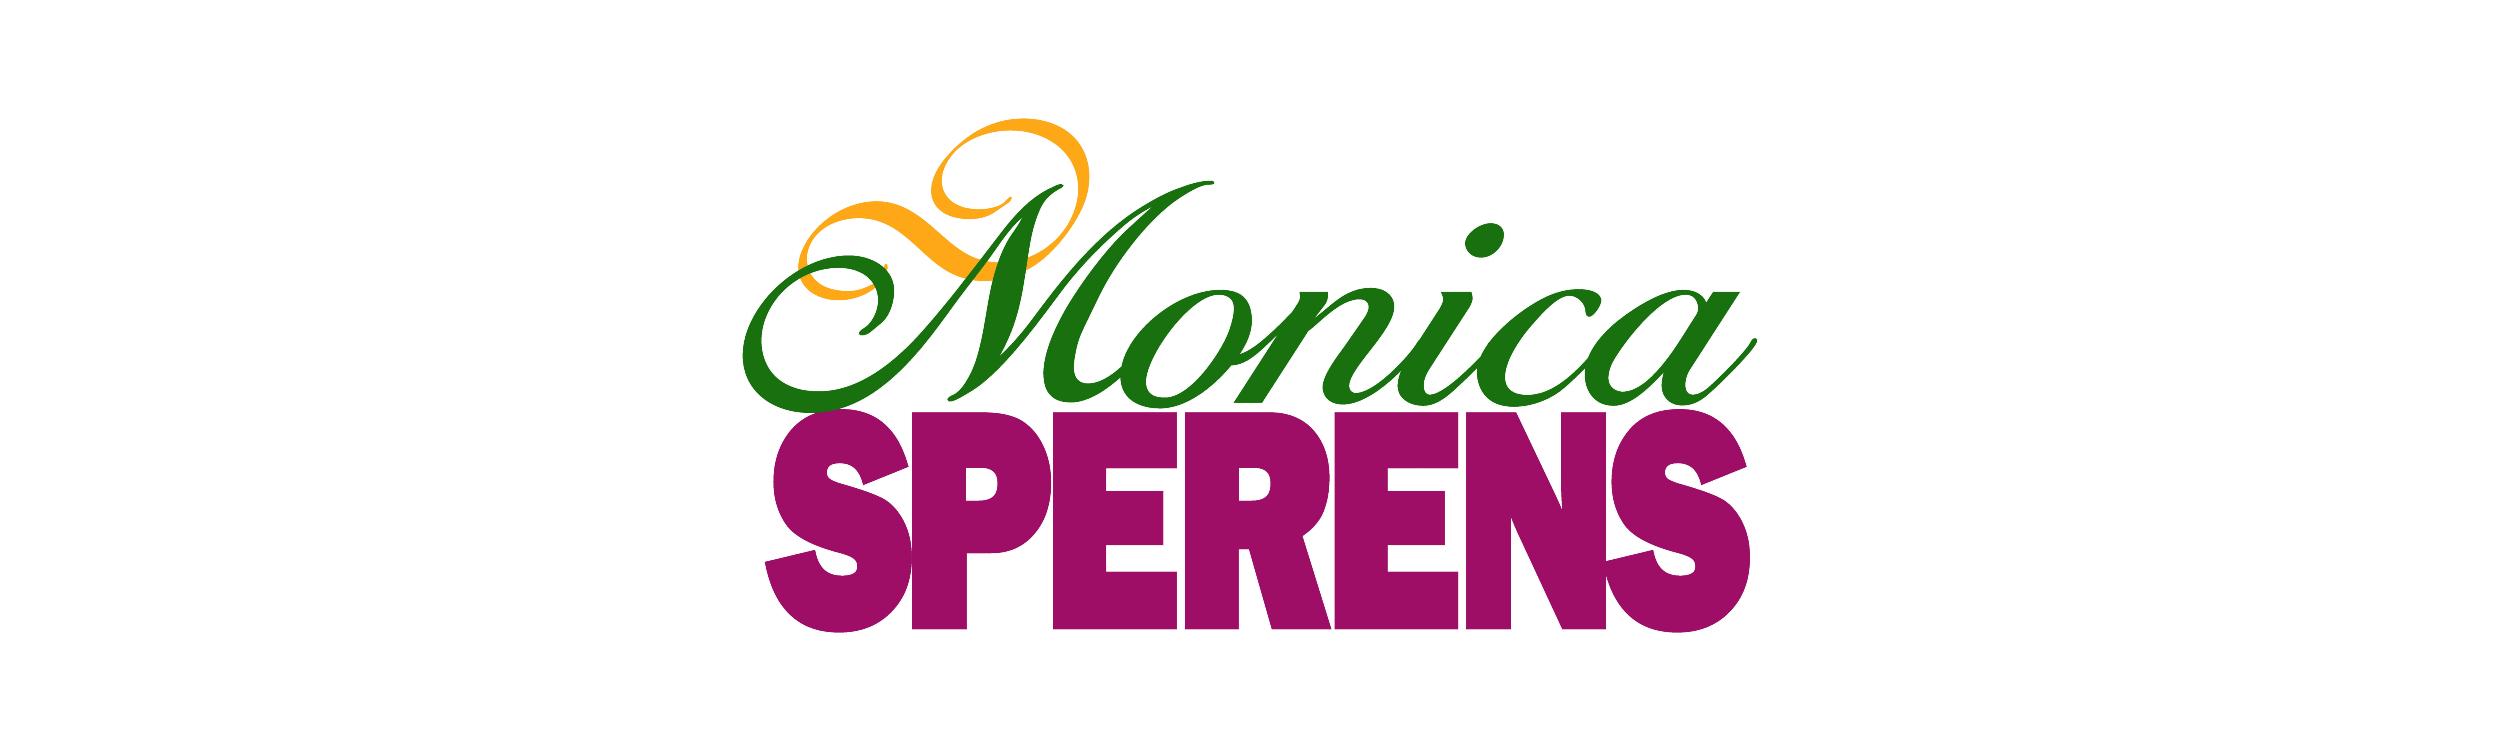 Monica-sperens-logotype